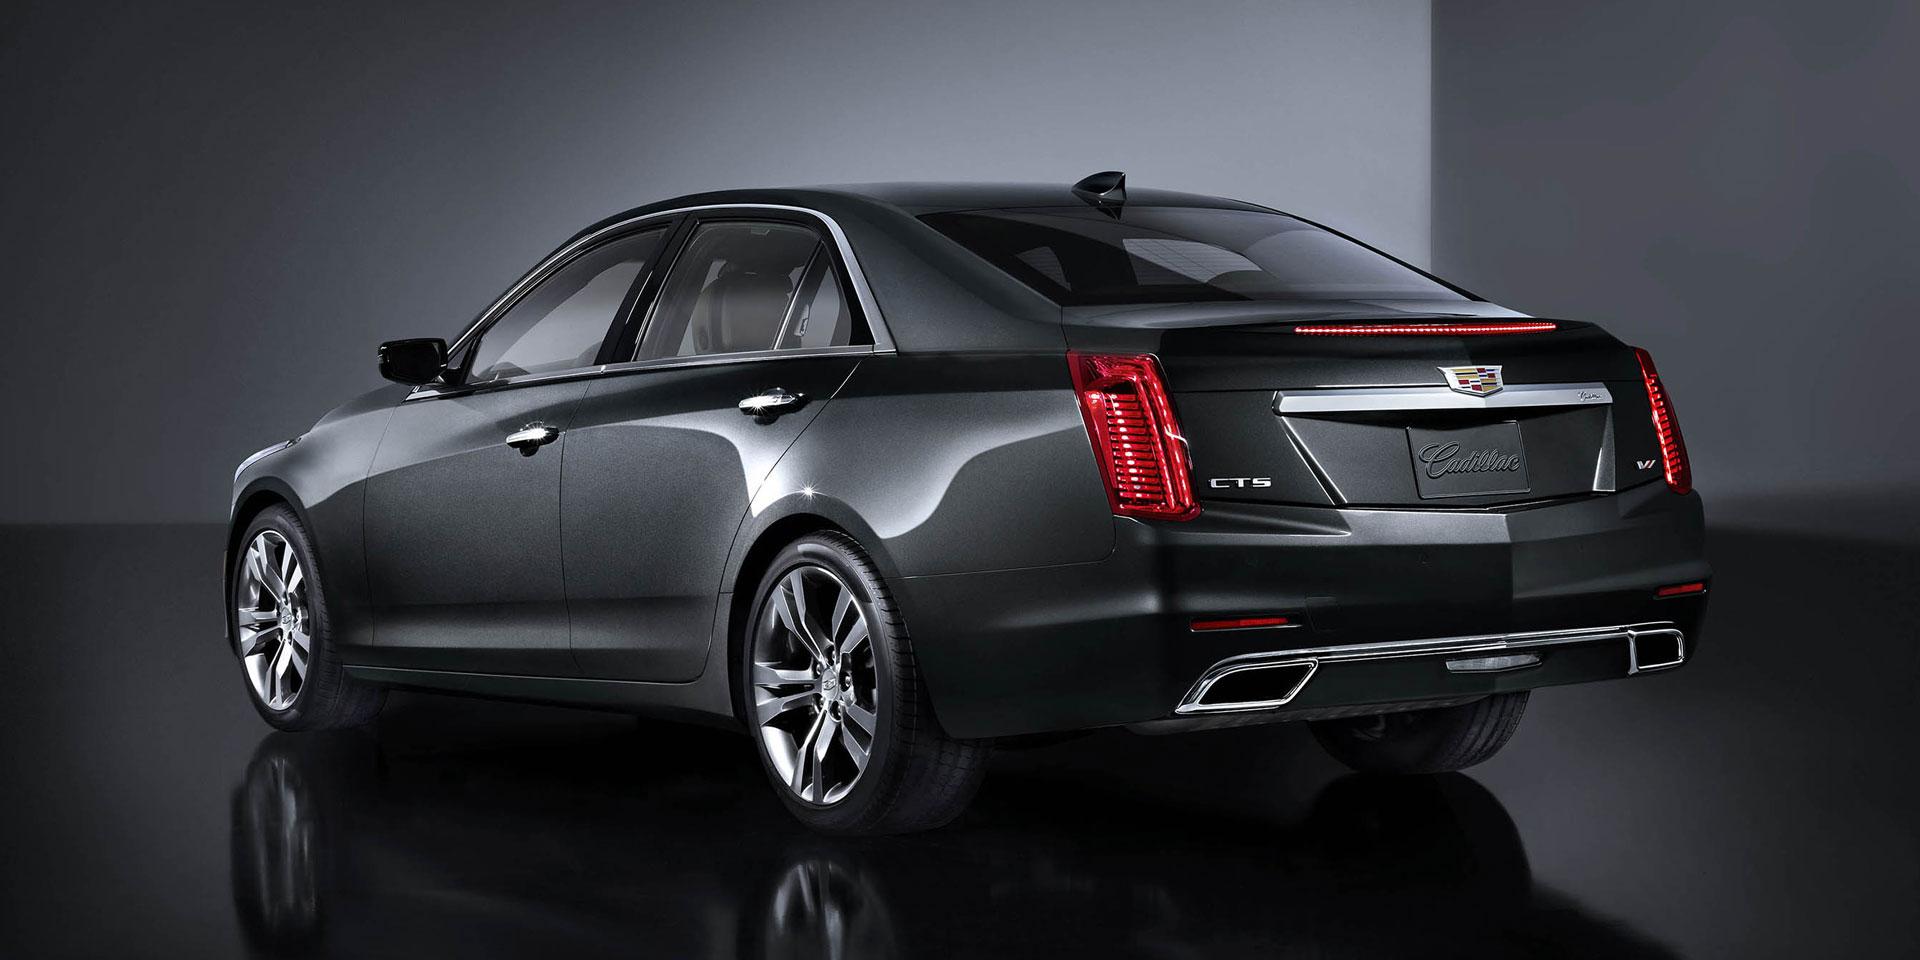 detroit concept auto door img cadillac show cts coupe photos